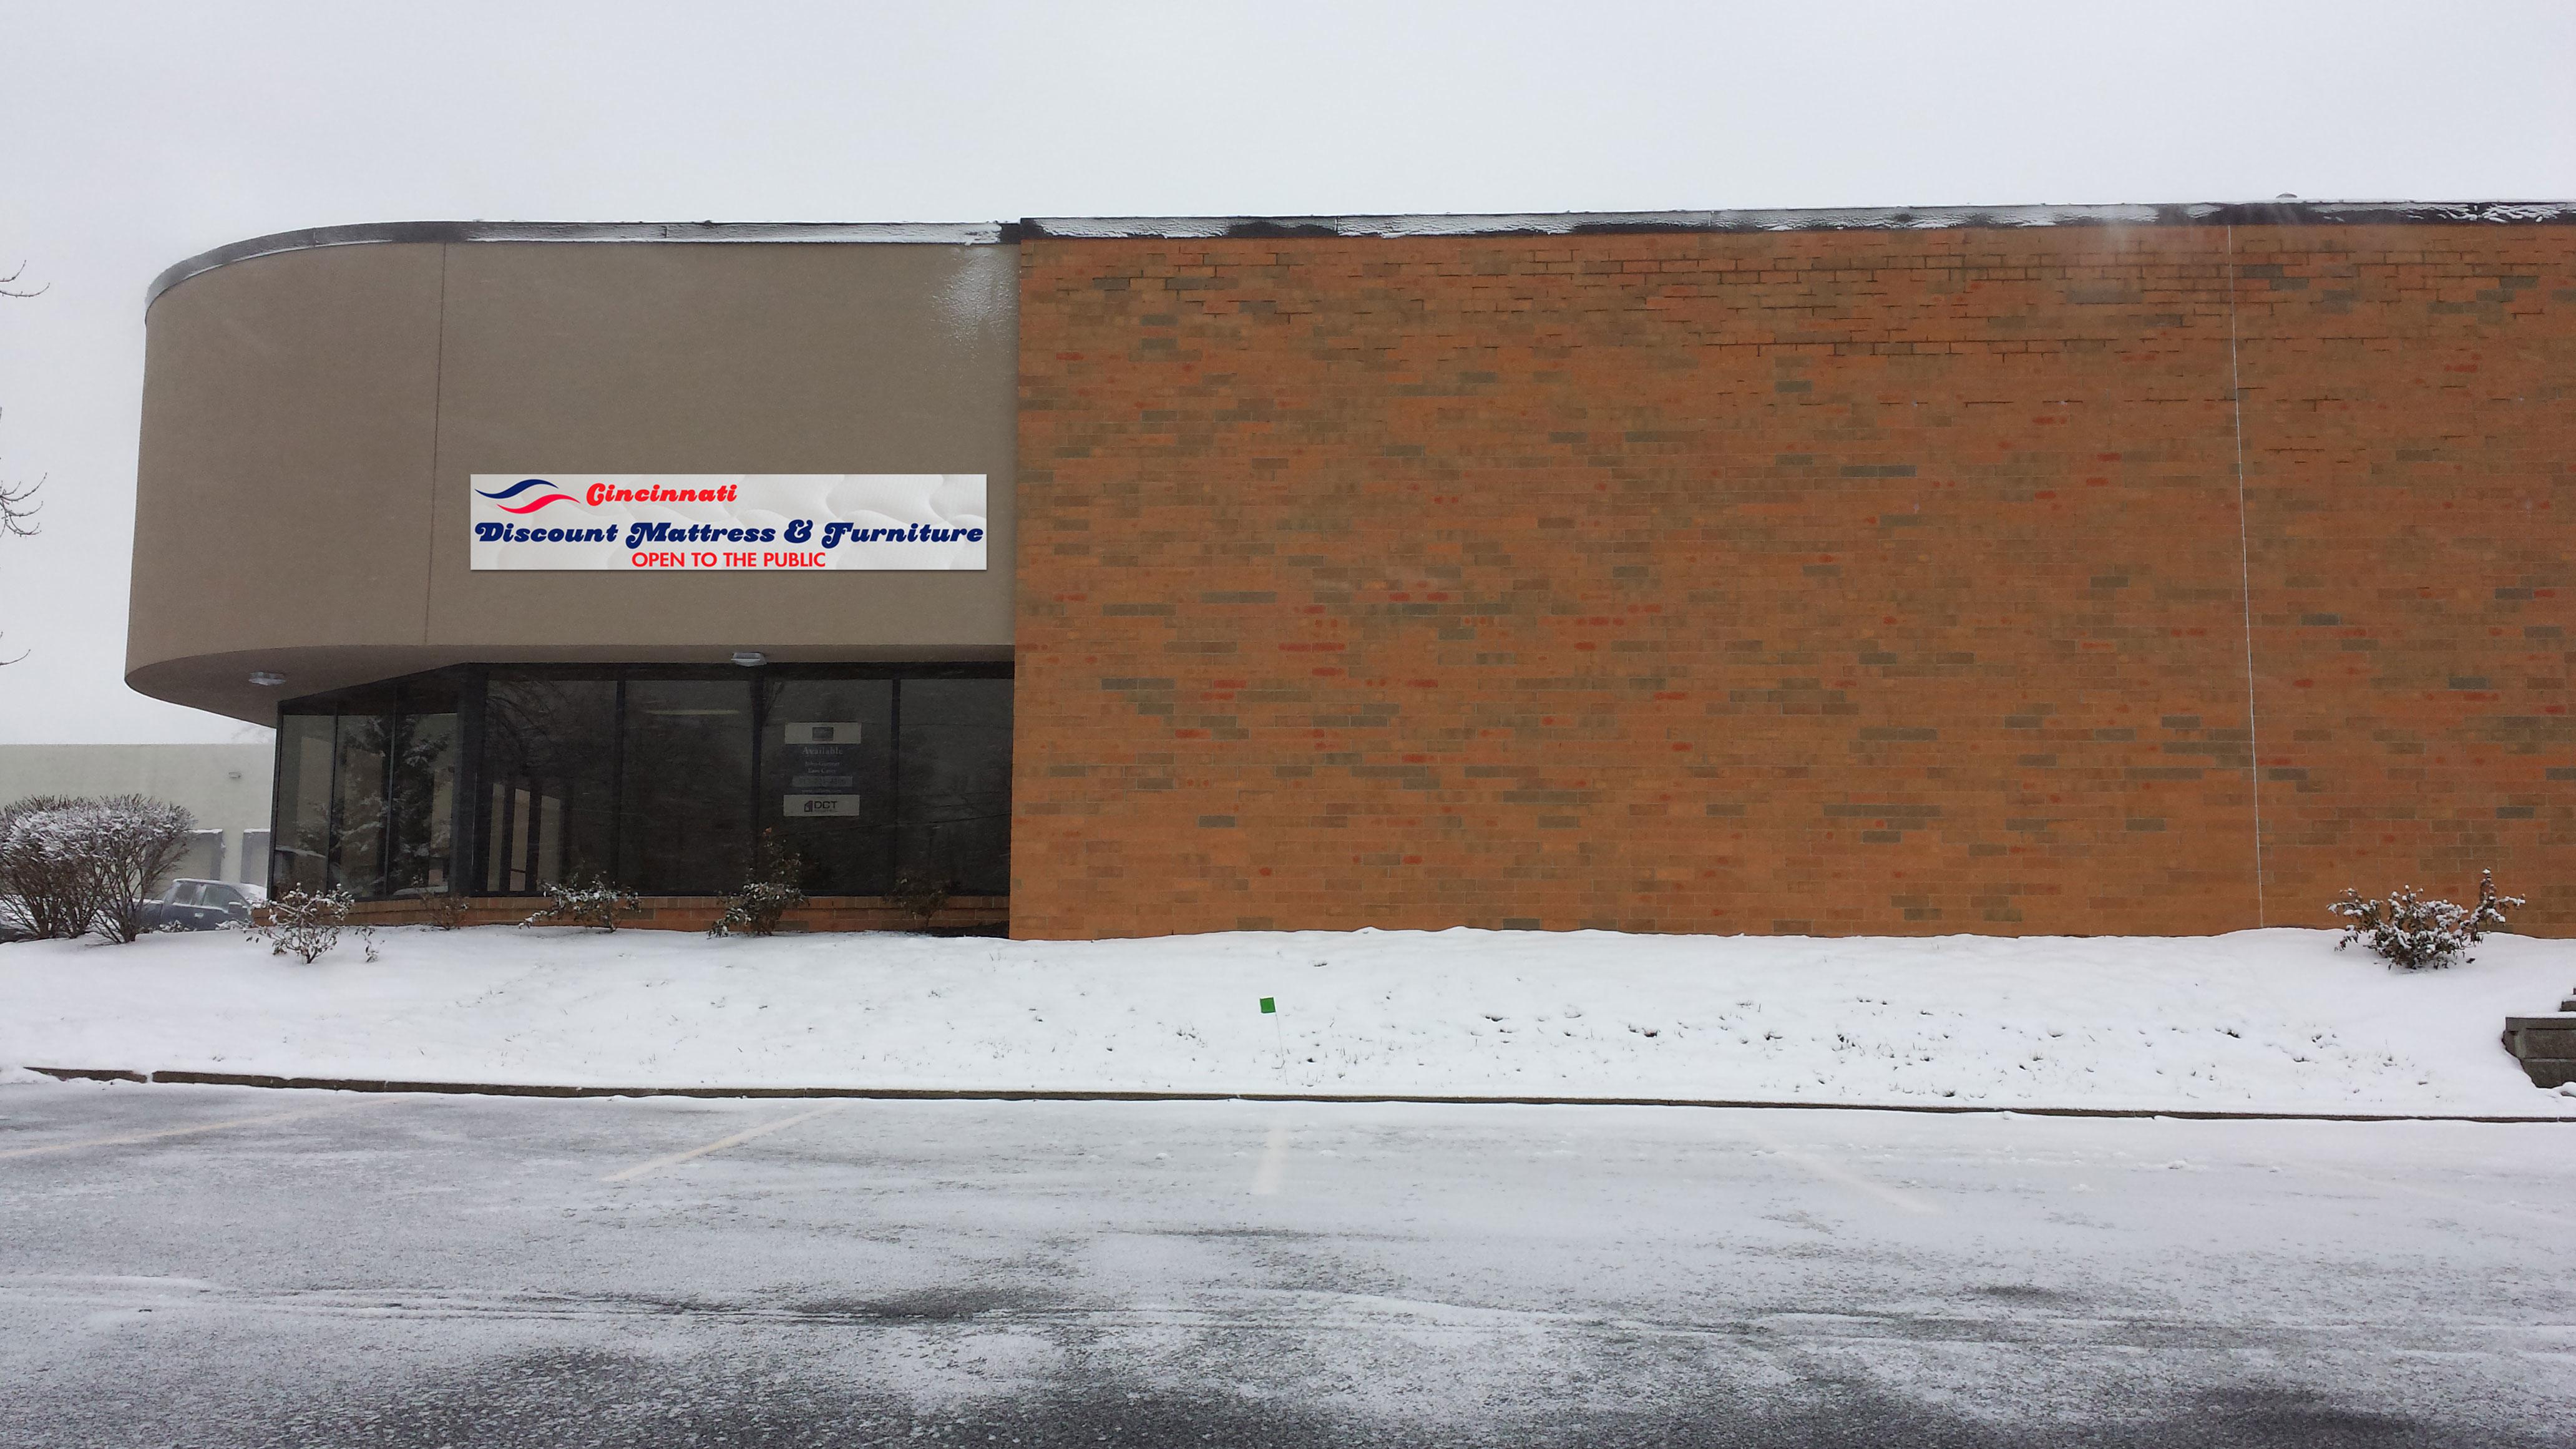 Cincinnati Discount Mattress & Furniture coupons and